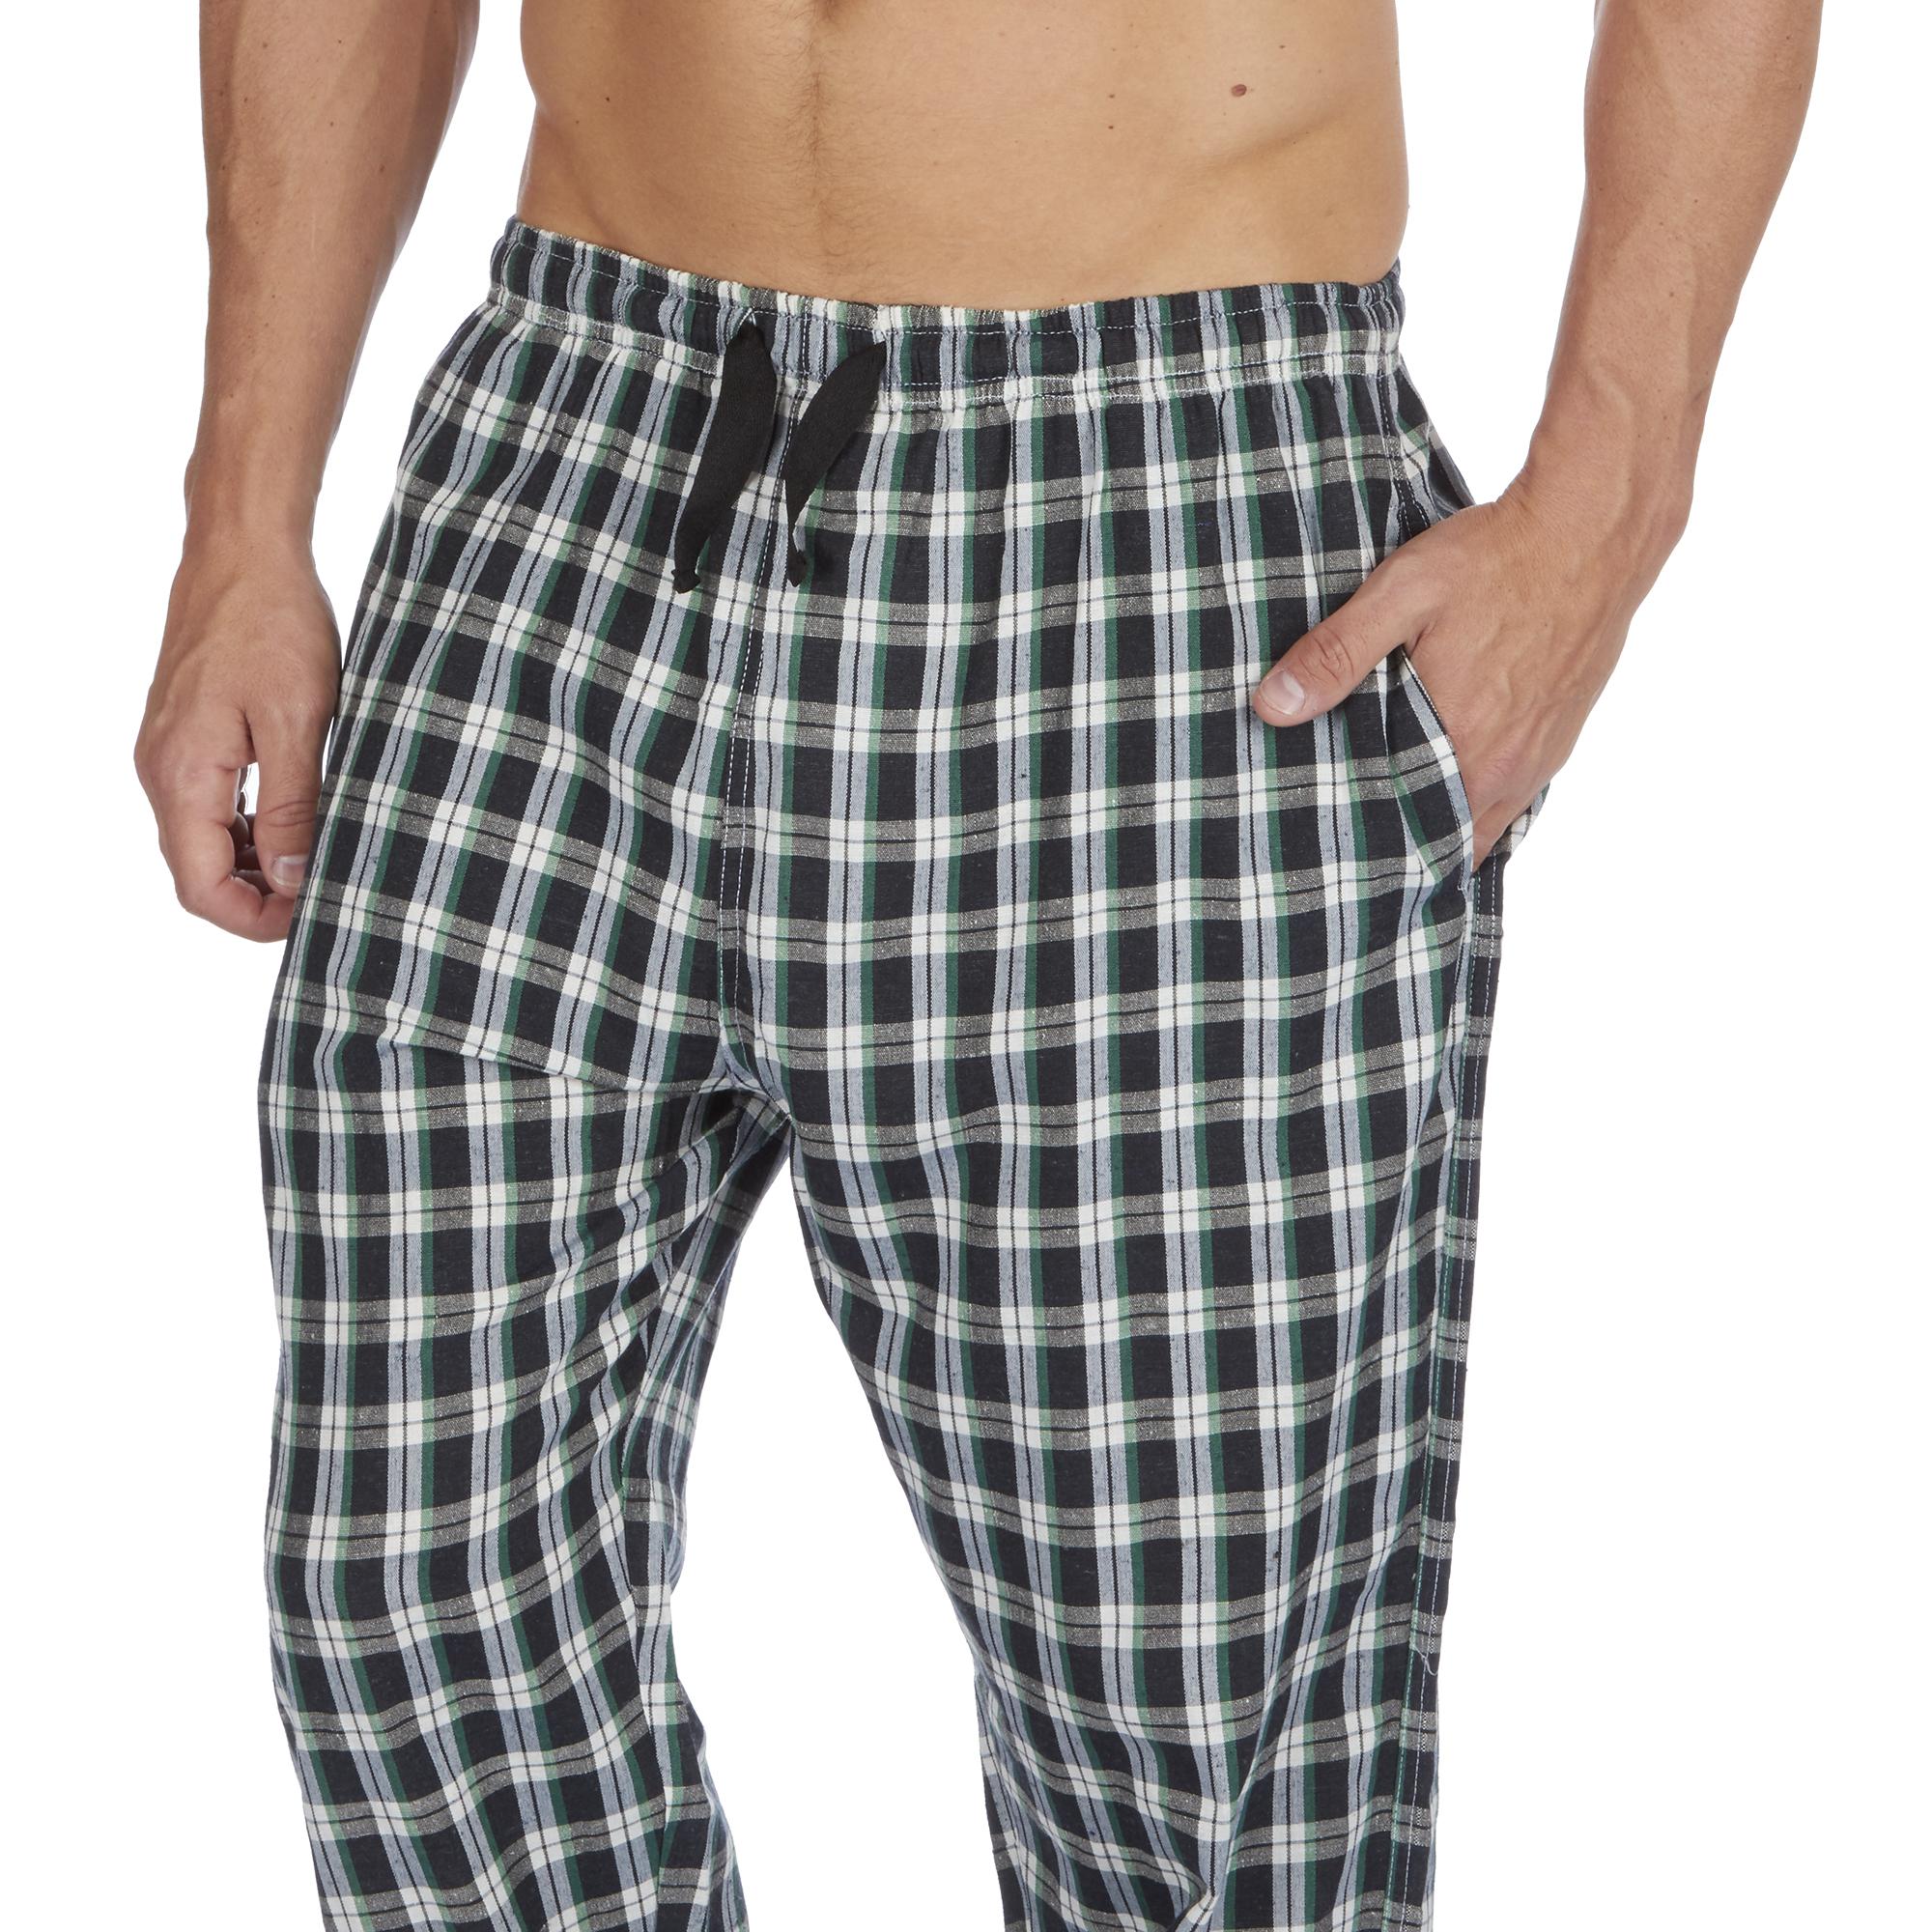 Jason-Jones-Homme-Carreaux-Tisse-Pyjama-Pantalon-en-Coton-Melange-Serge-PJ-Lounge-Pants miniature 12